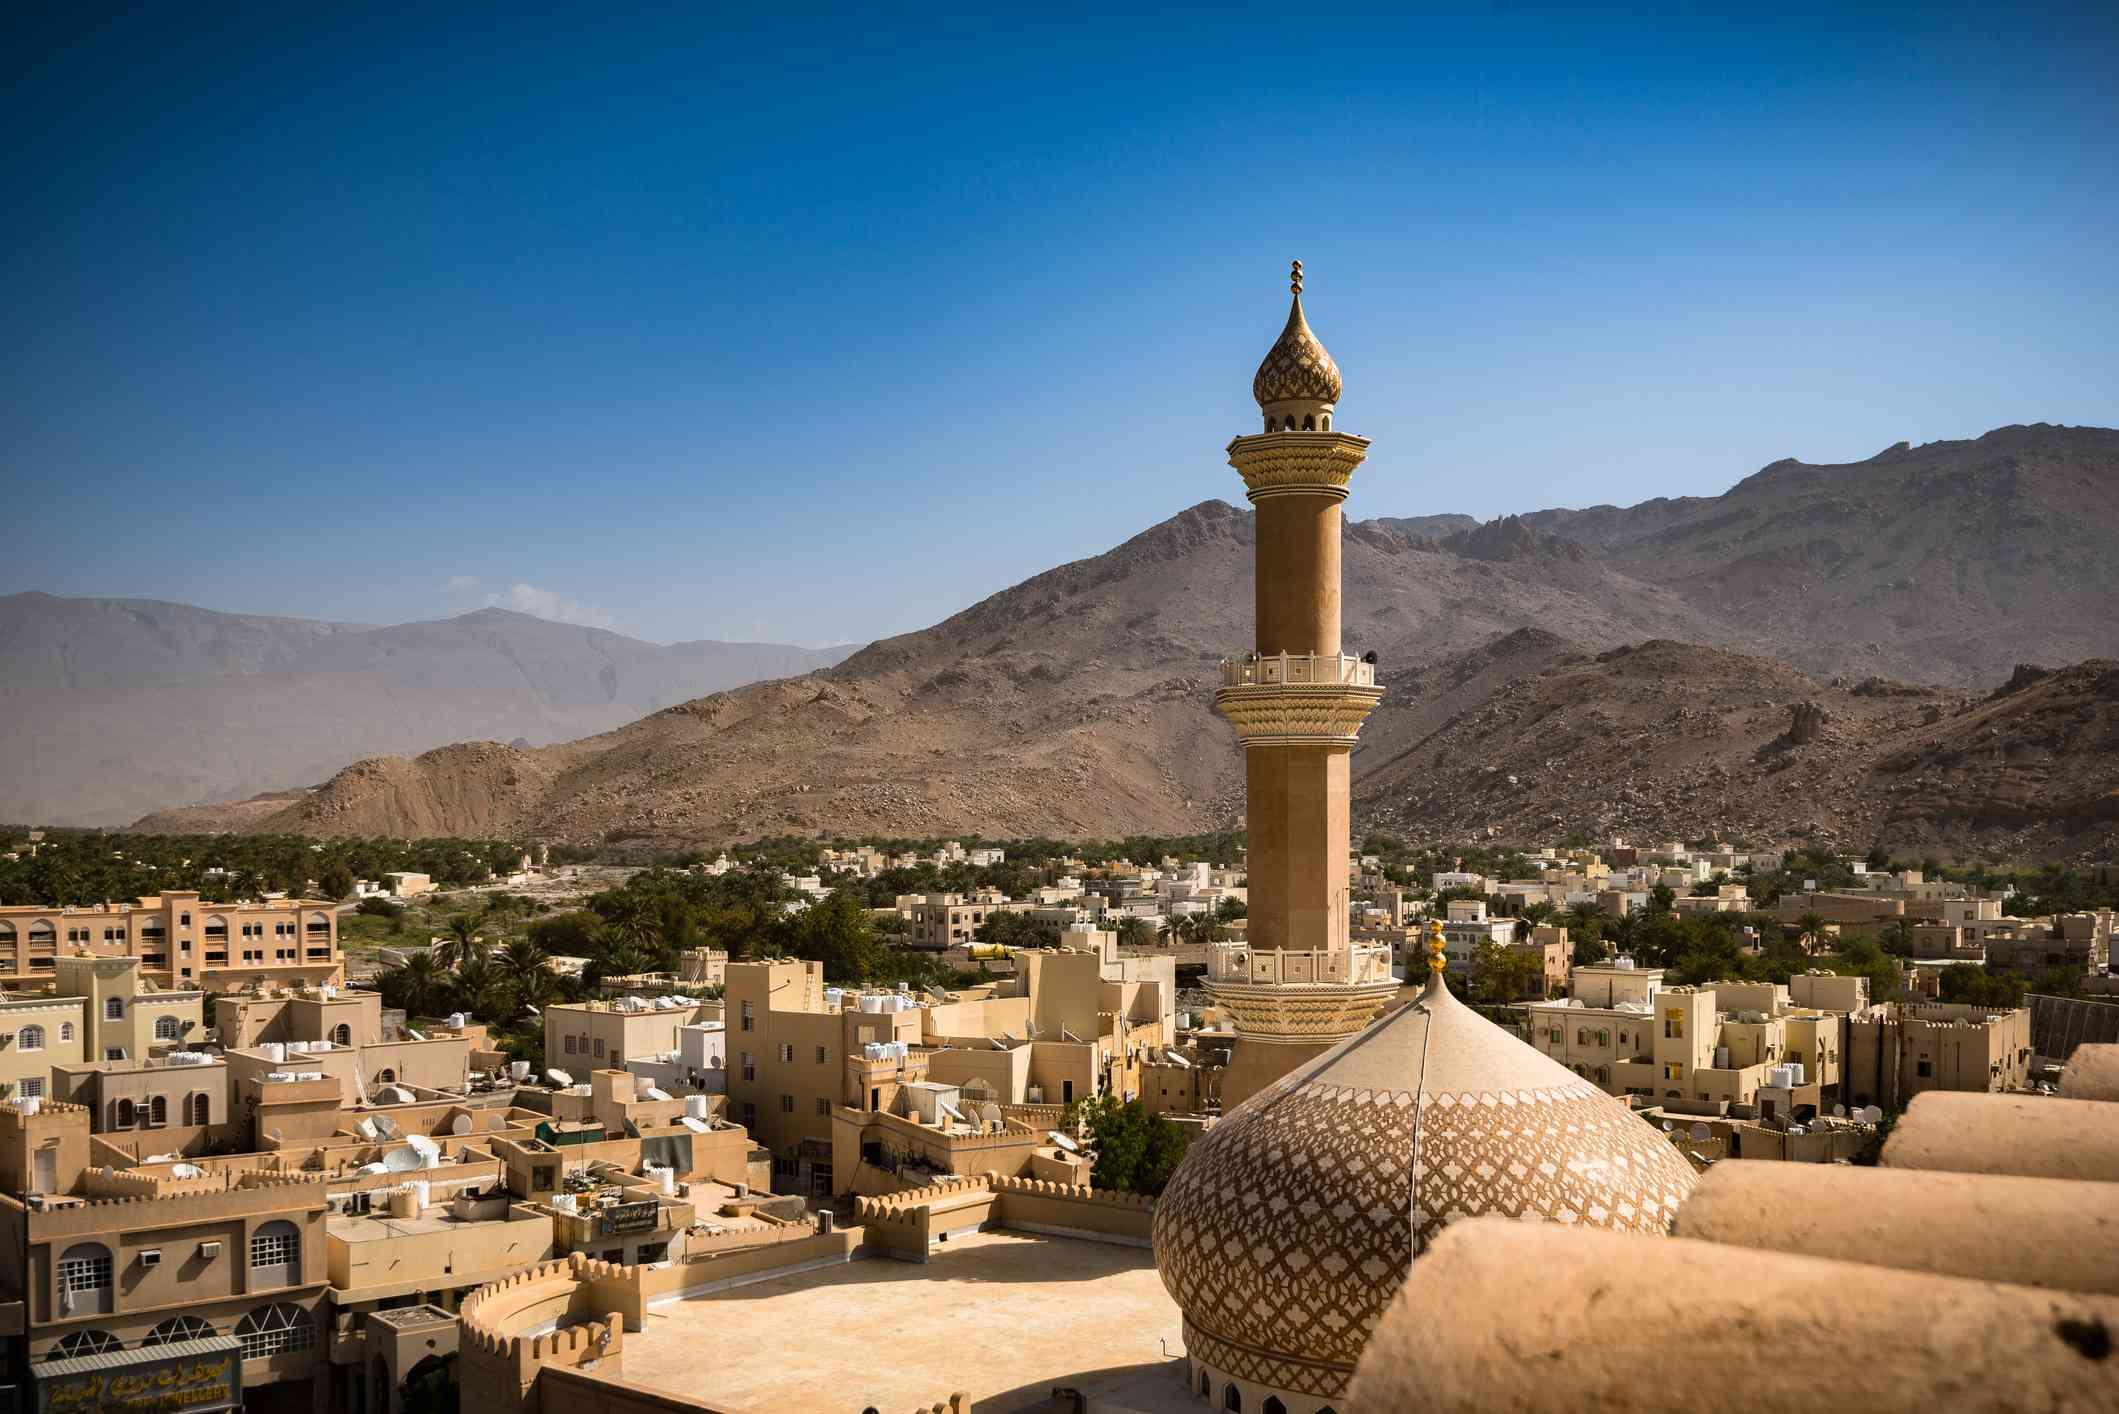 View of the marinara an dome of Nizwa Mosque, Nizwa, Oman